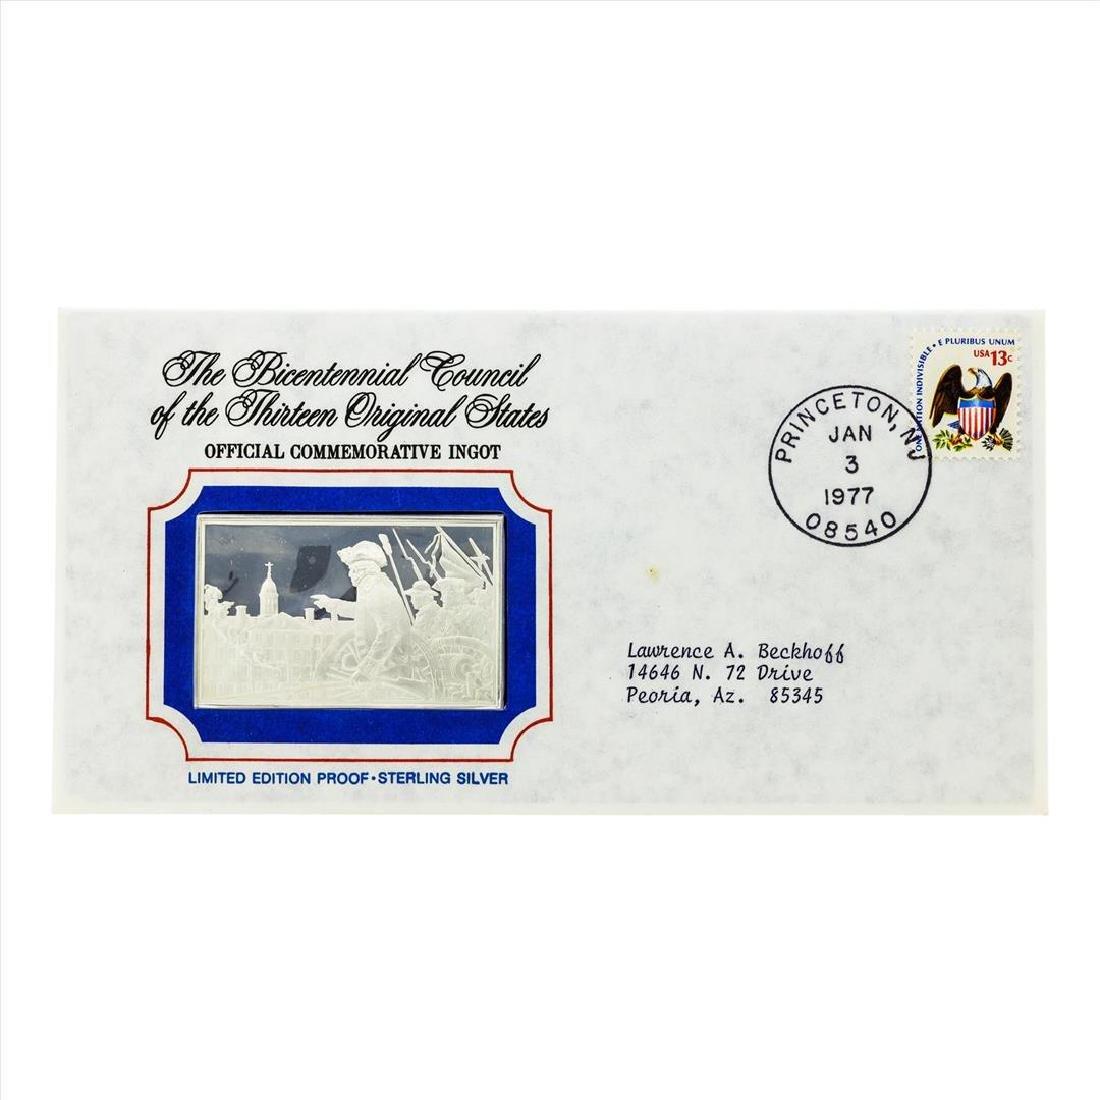 Bicentennial Council of the Thirteen Original States